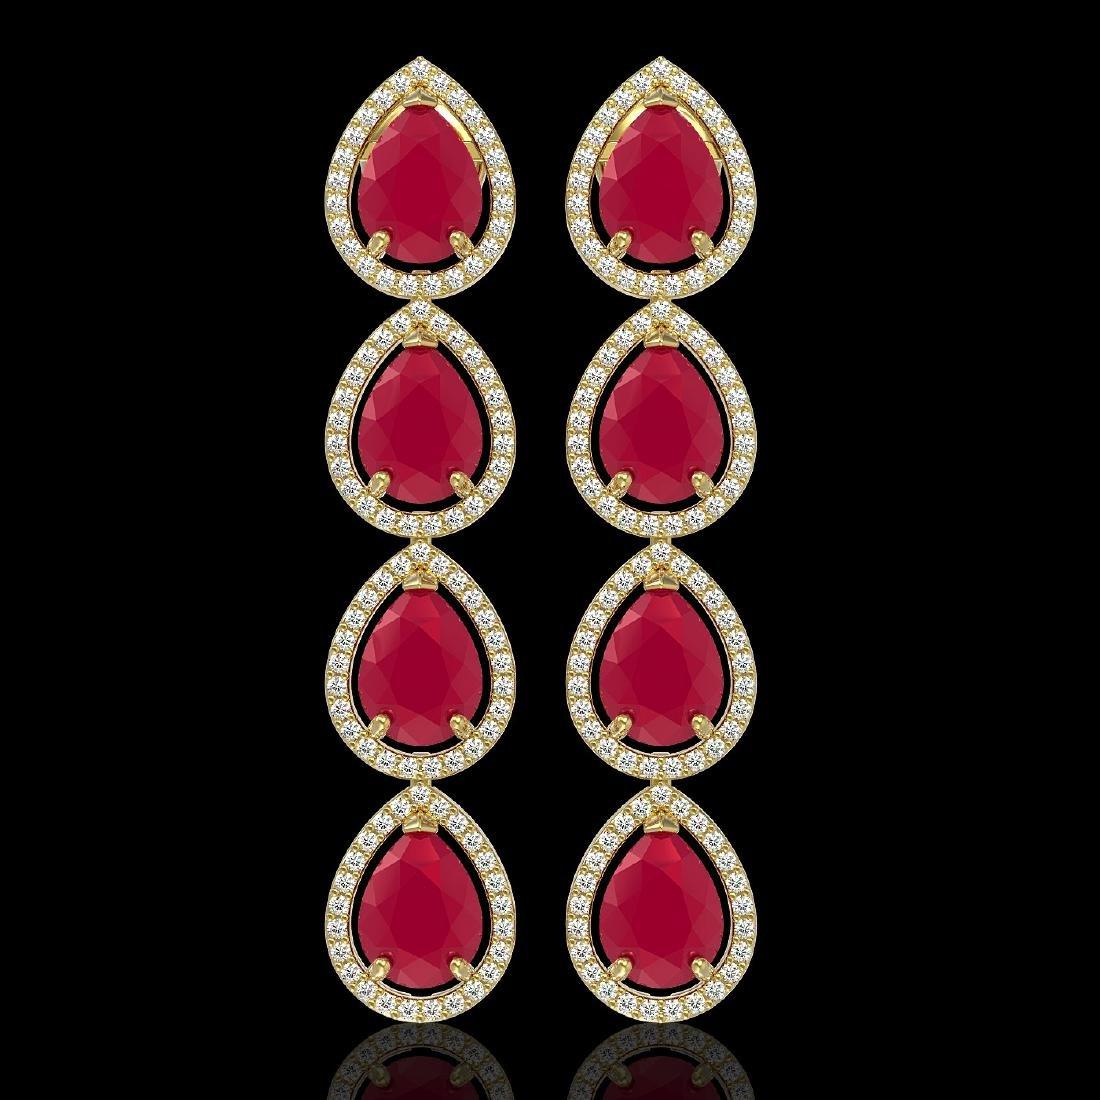 16.01 CTW Ruby & Diamond Halo Earrings 10K Yellow Gold